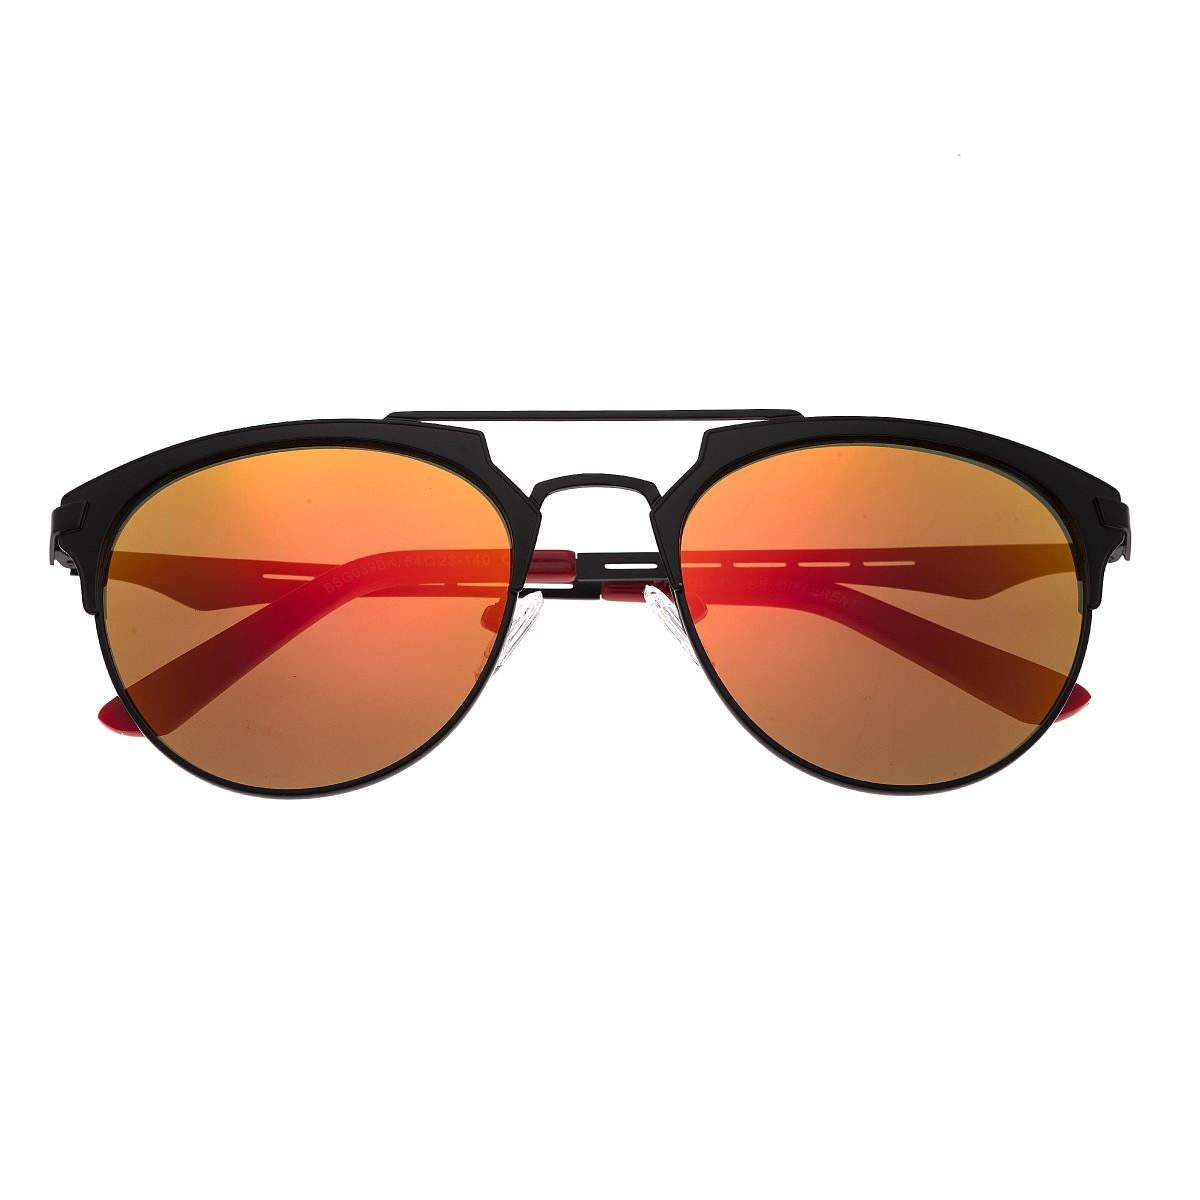 be0db14bd210 Breed Hercules Titanium Polarized Sunglasses - Black/Red-Yellow BSG039BK